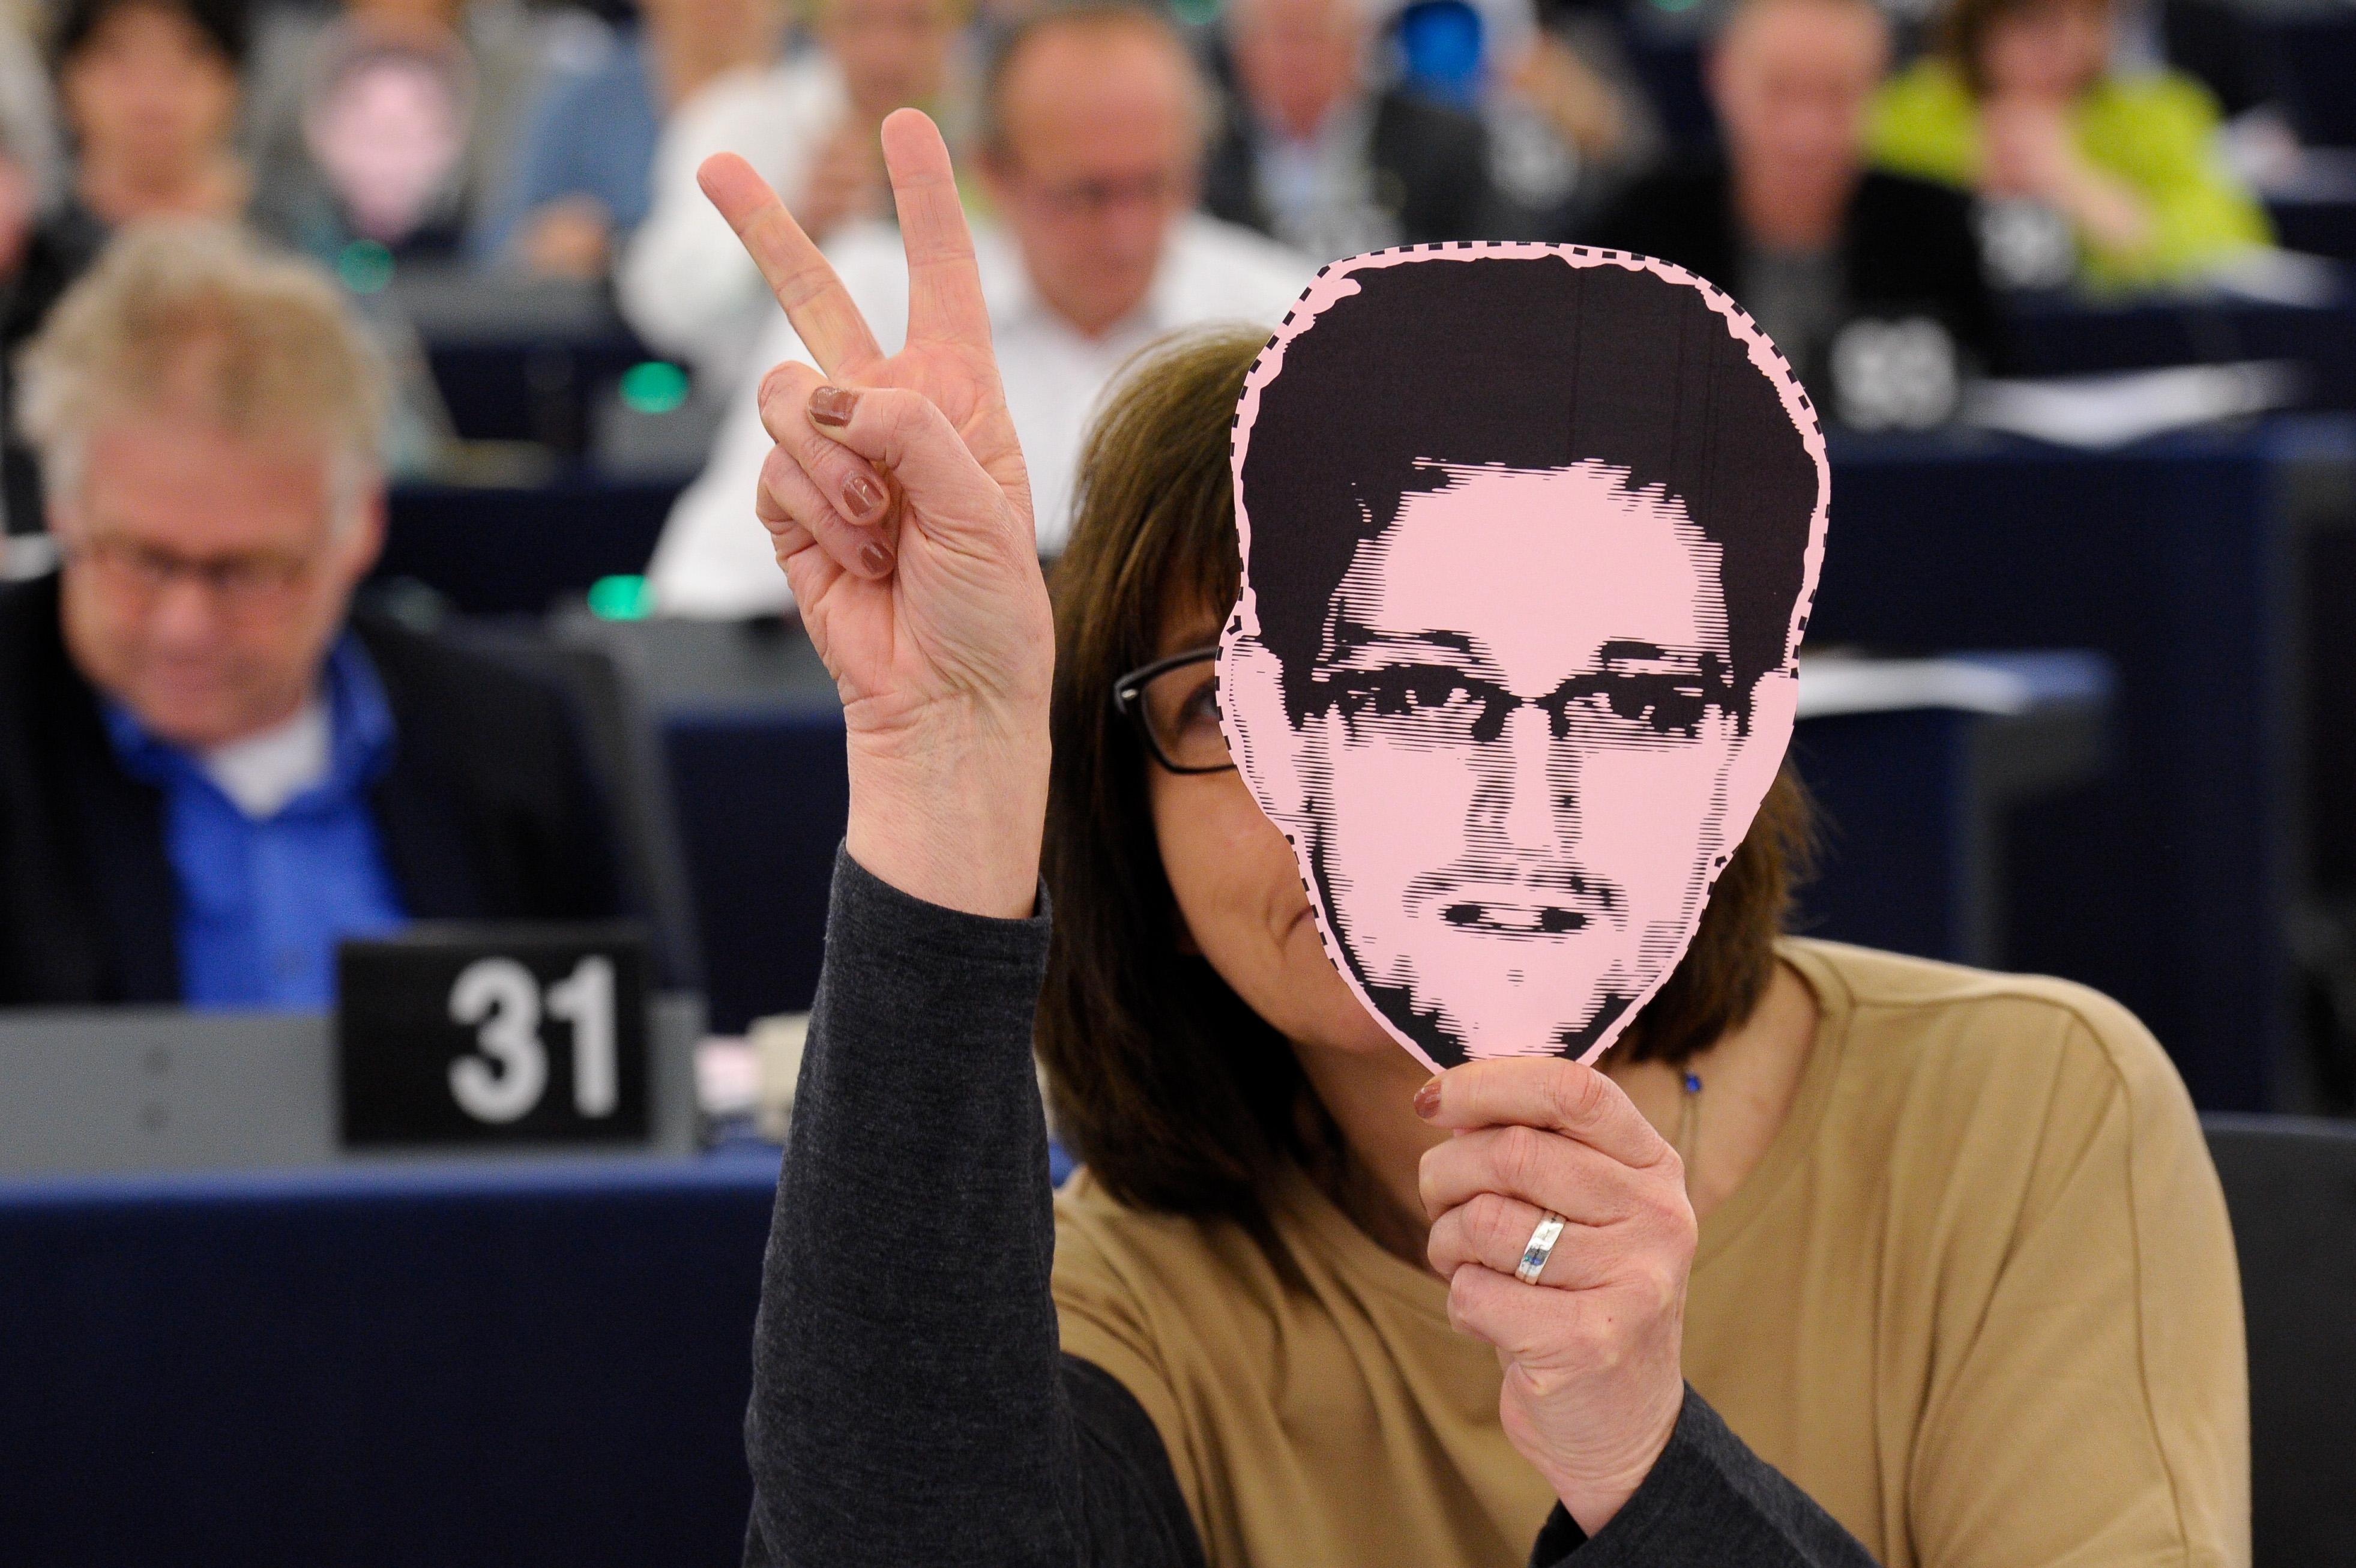 EU Europa Nachrichten Whistleblower